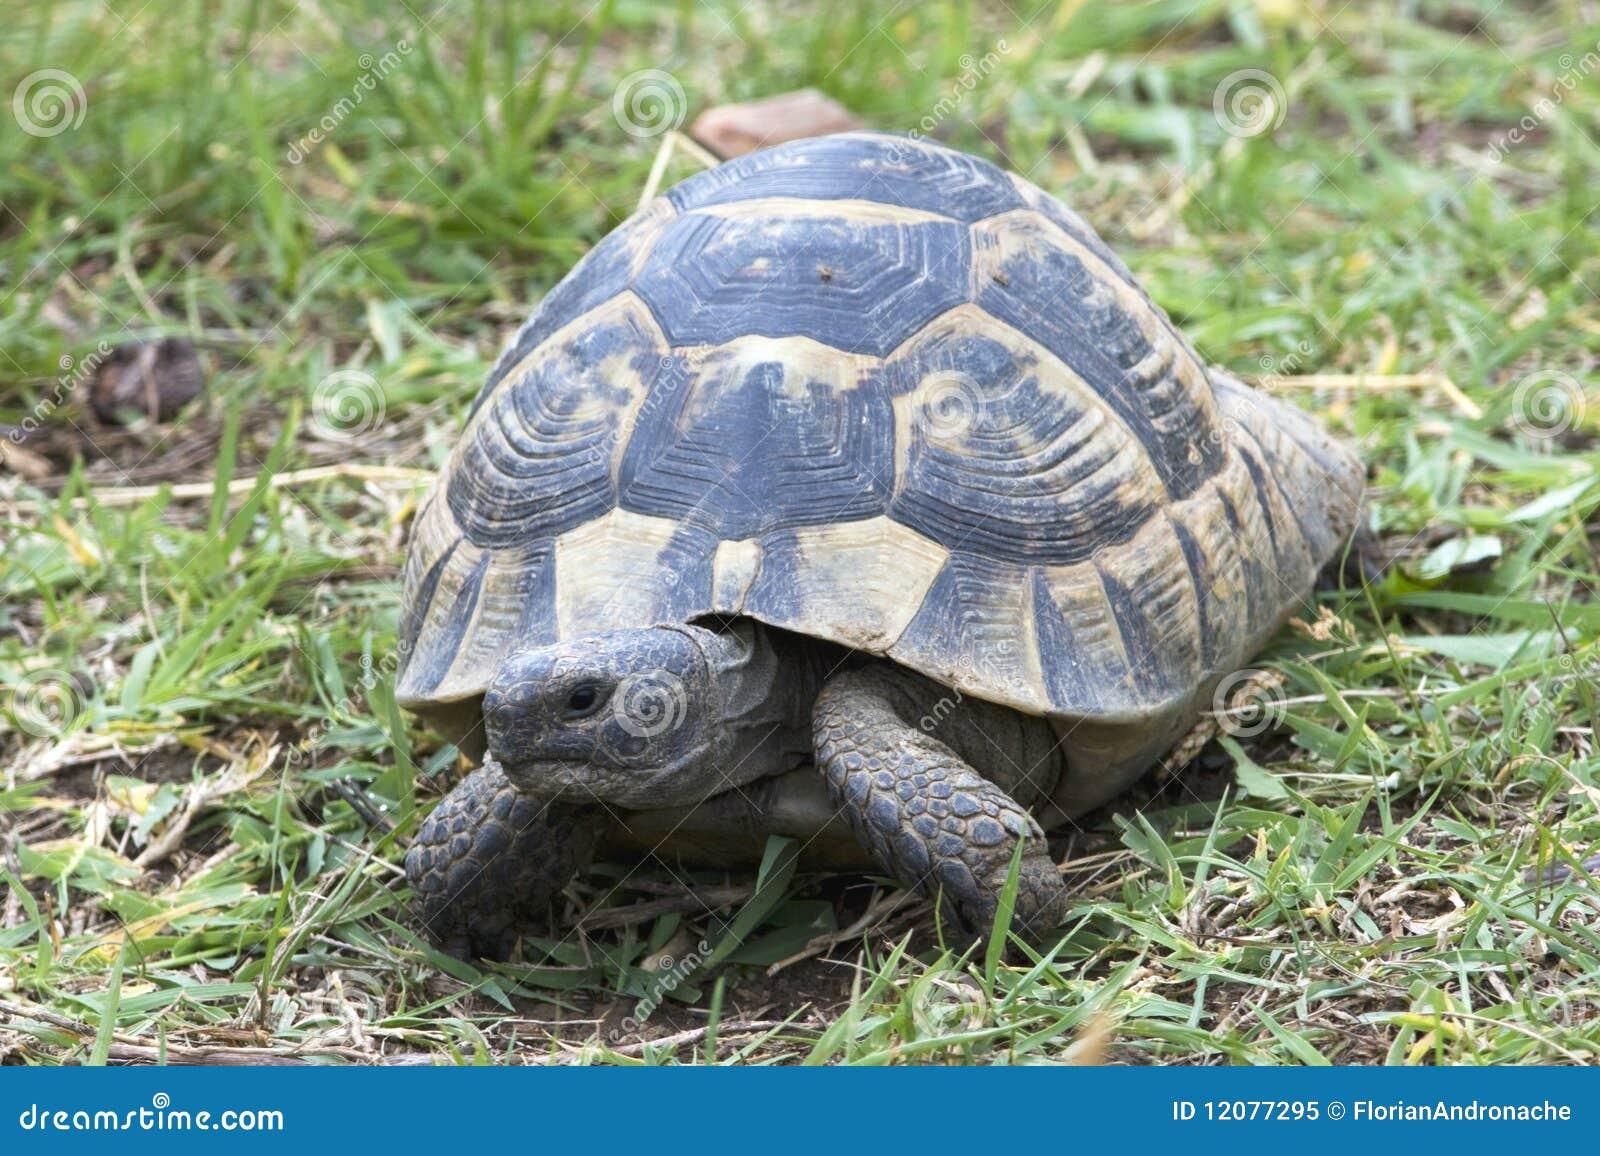 ibera greek tortoise - photo #18